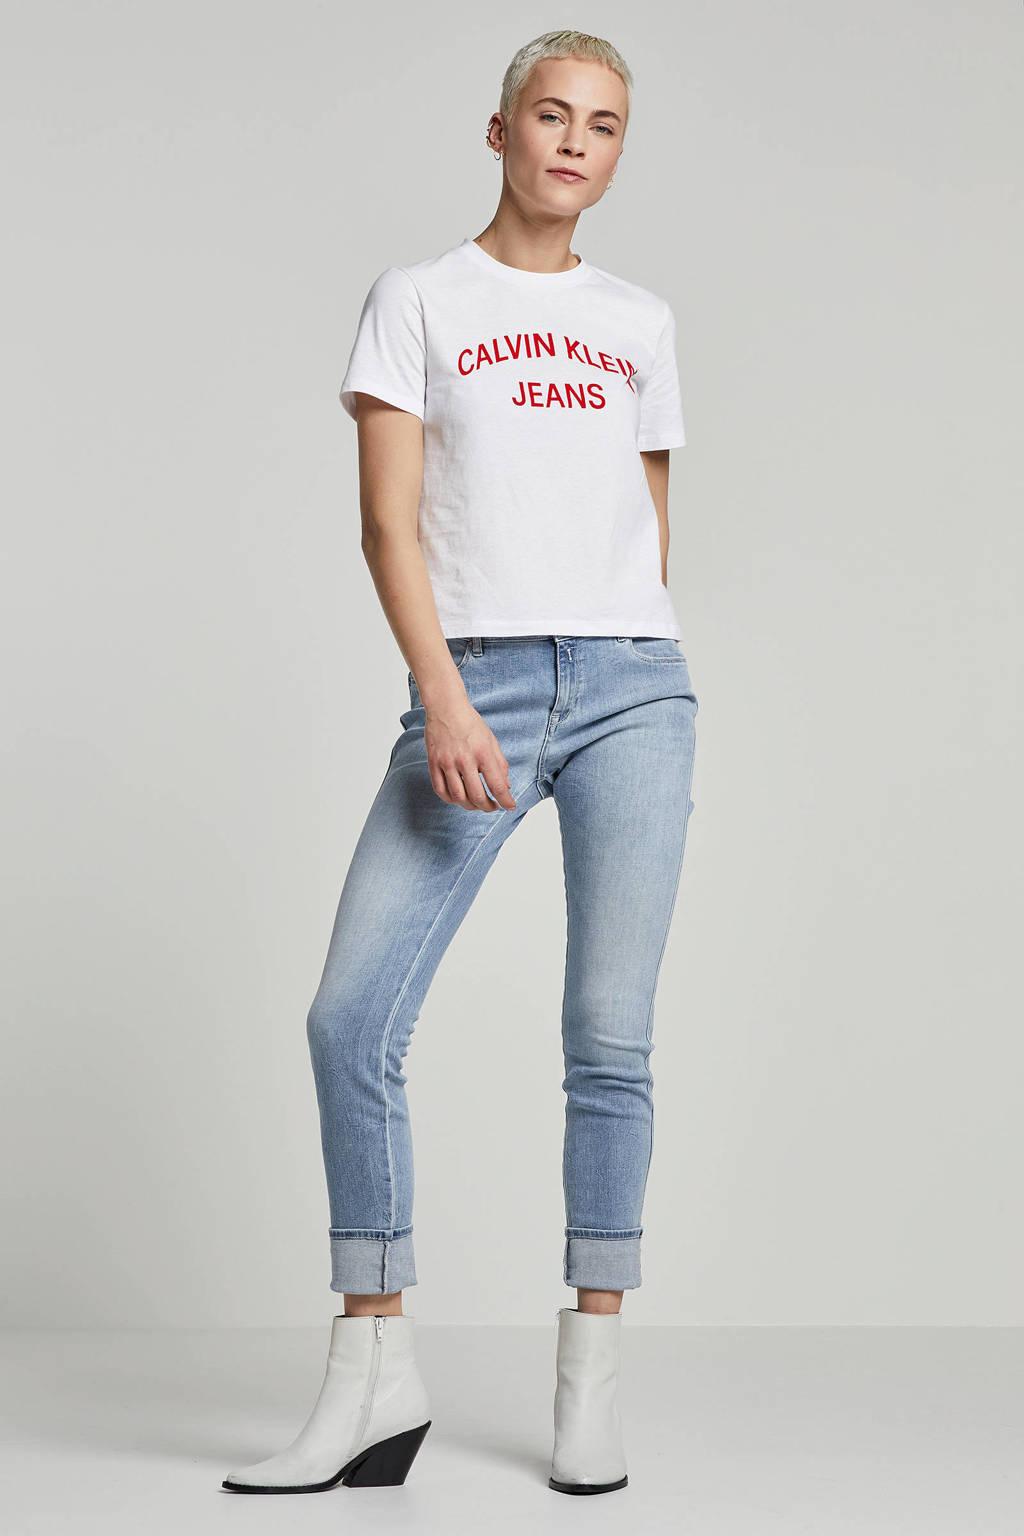 Calvin Klein Jeans t-shirt met flock print, Wit/rood